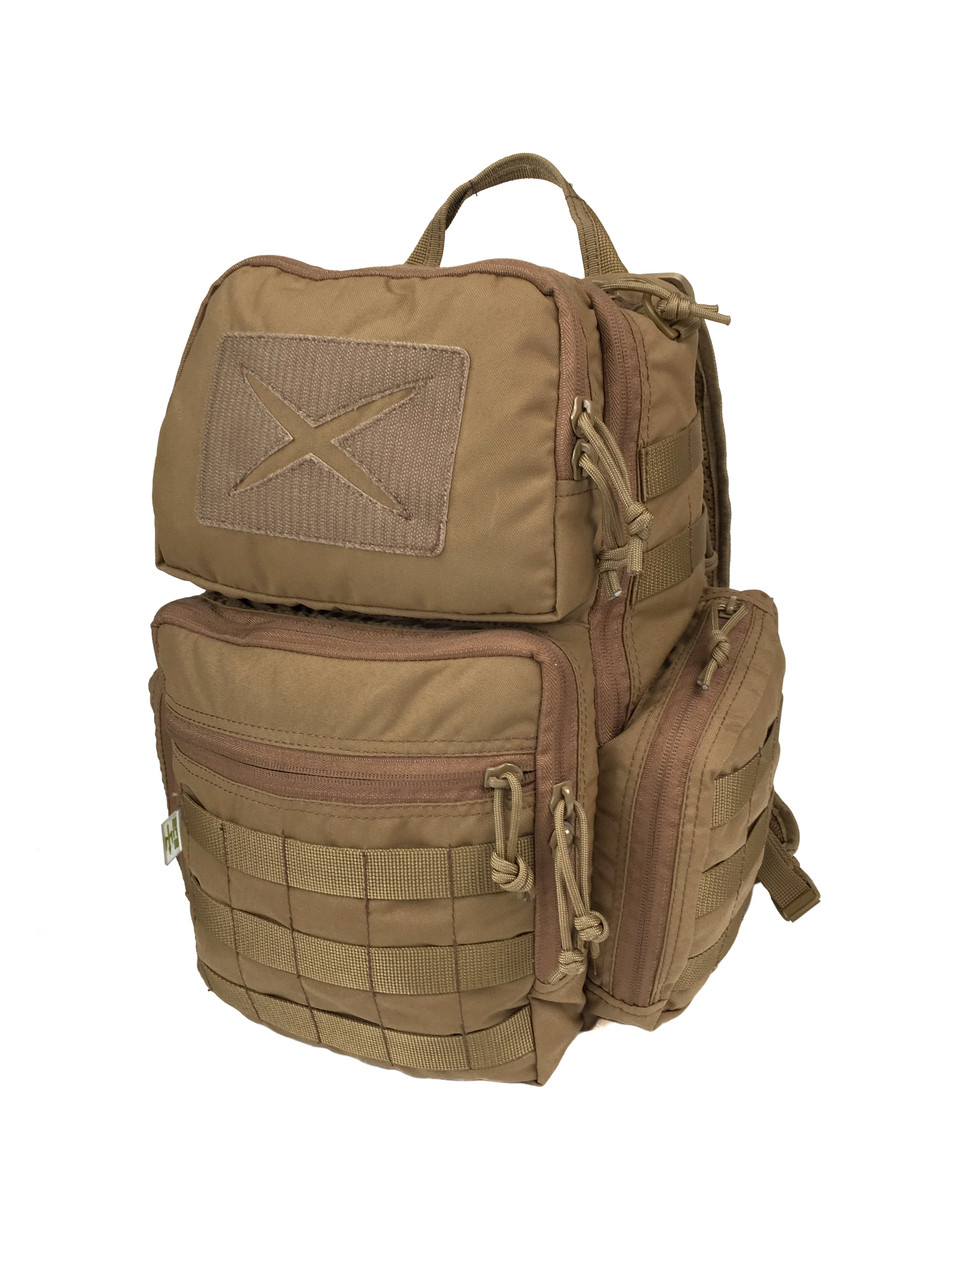 Тактический рюкзак М18 Coyote